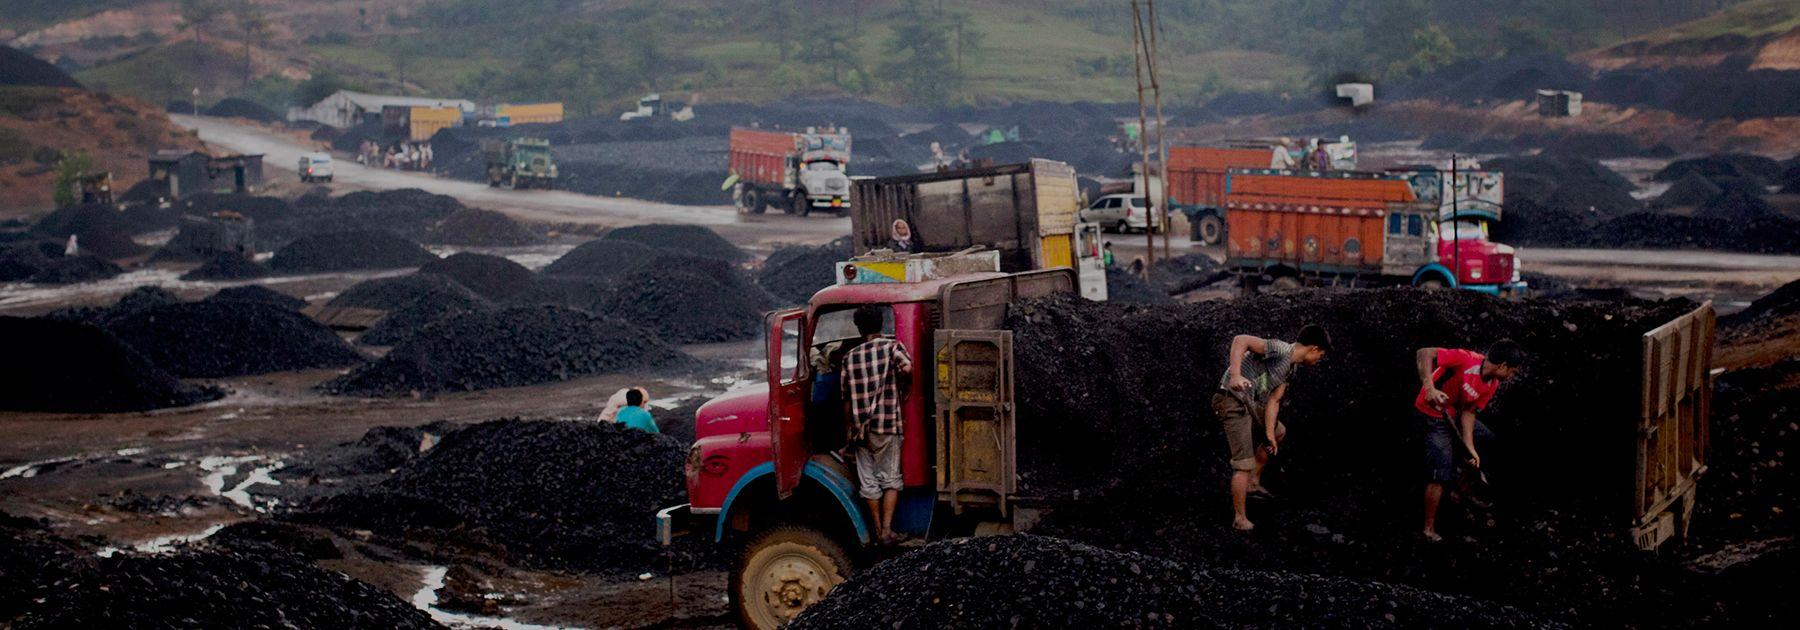 Workers load coal onto trucks at a coal depot near Lad Rymbai. (Daniel Berehulak/Getty Images)